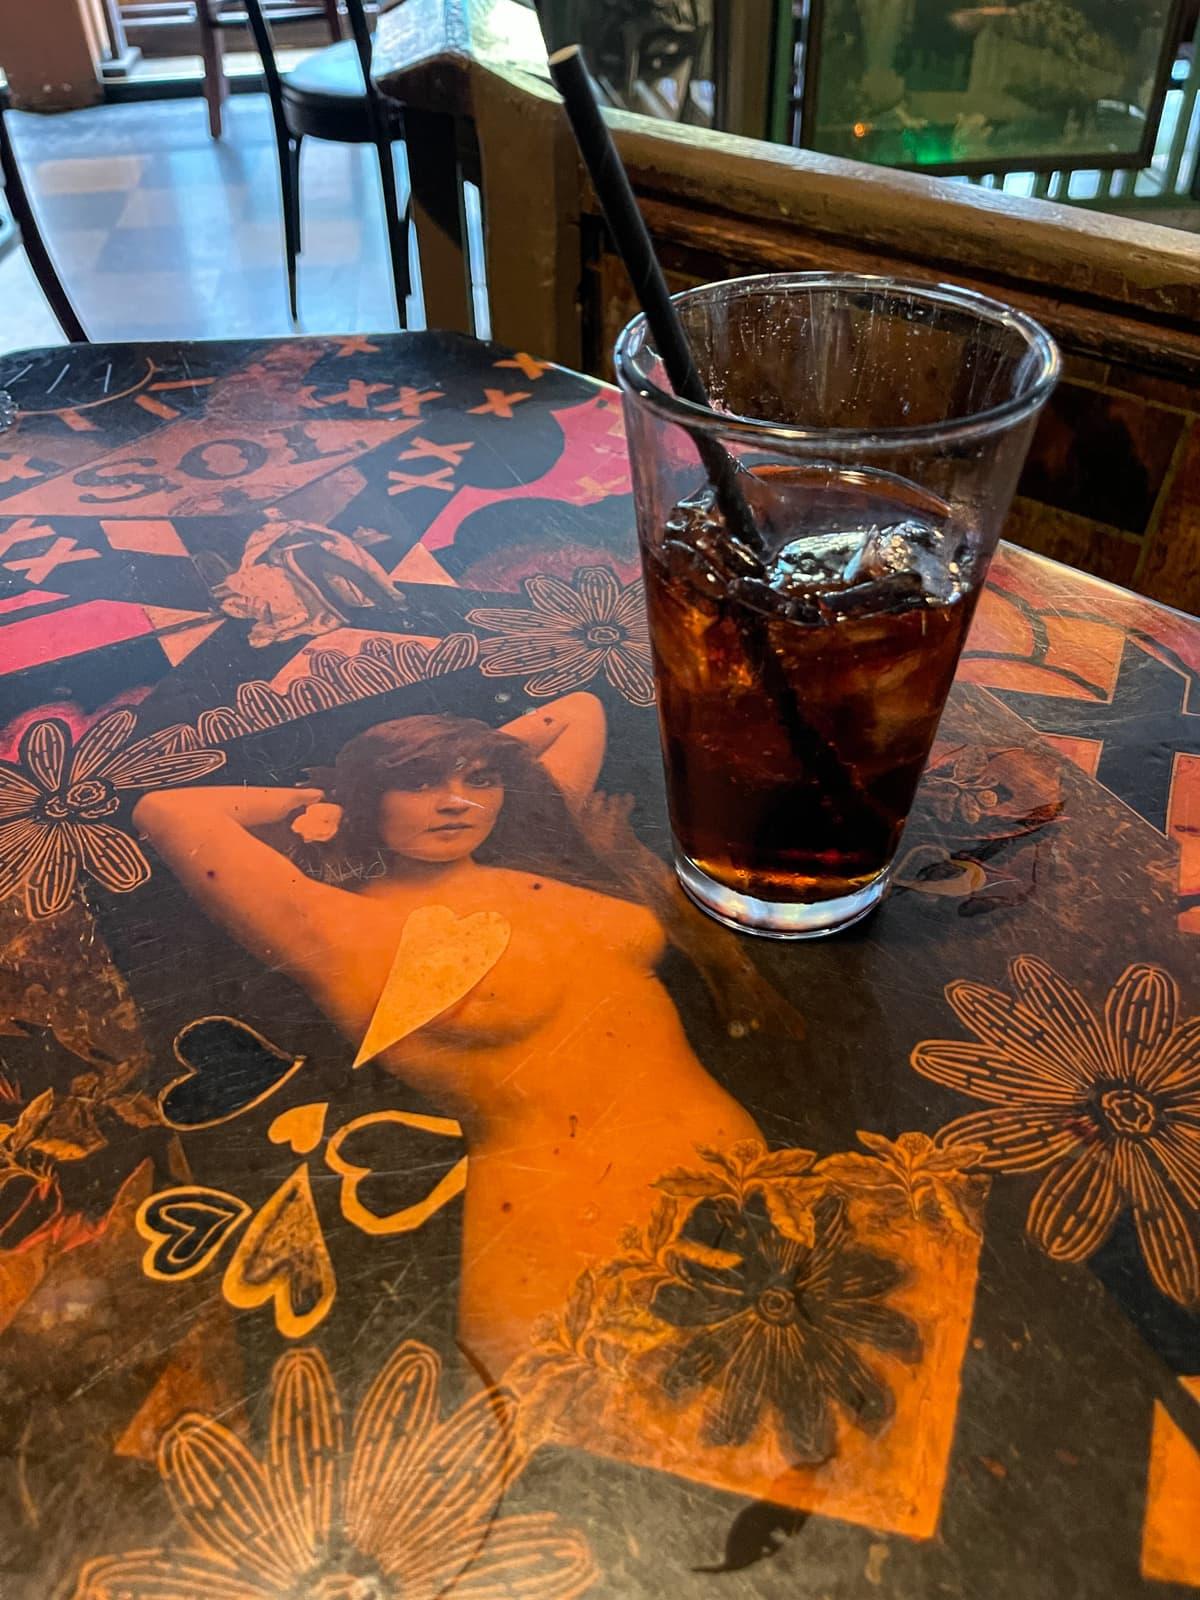 Table at Vesuvio Cafe